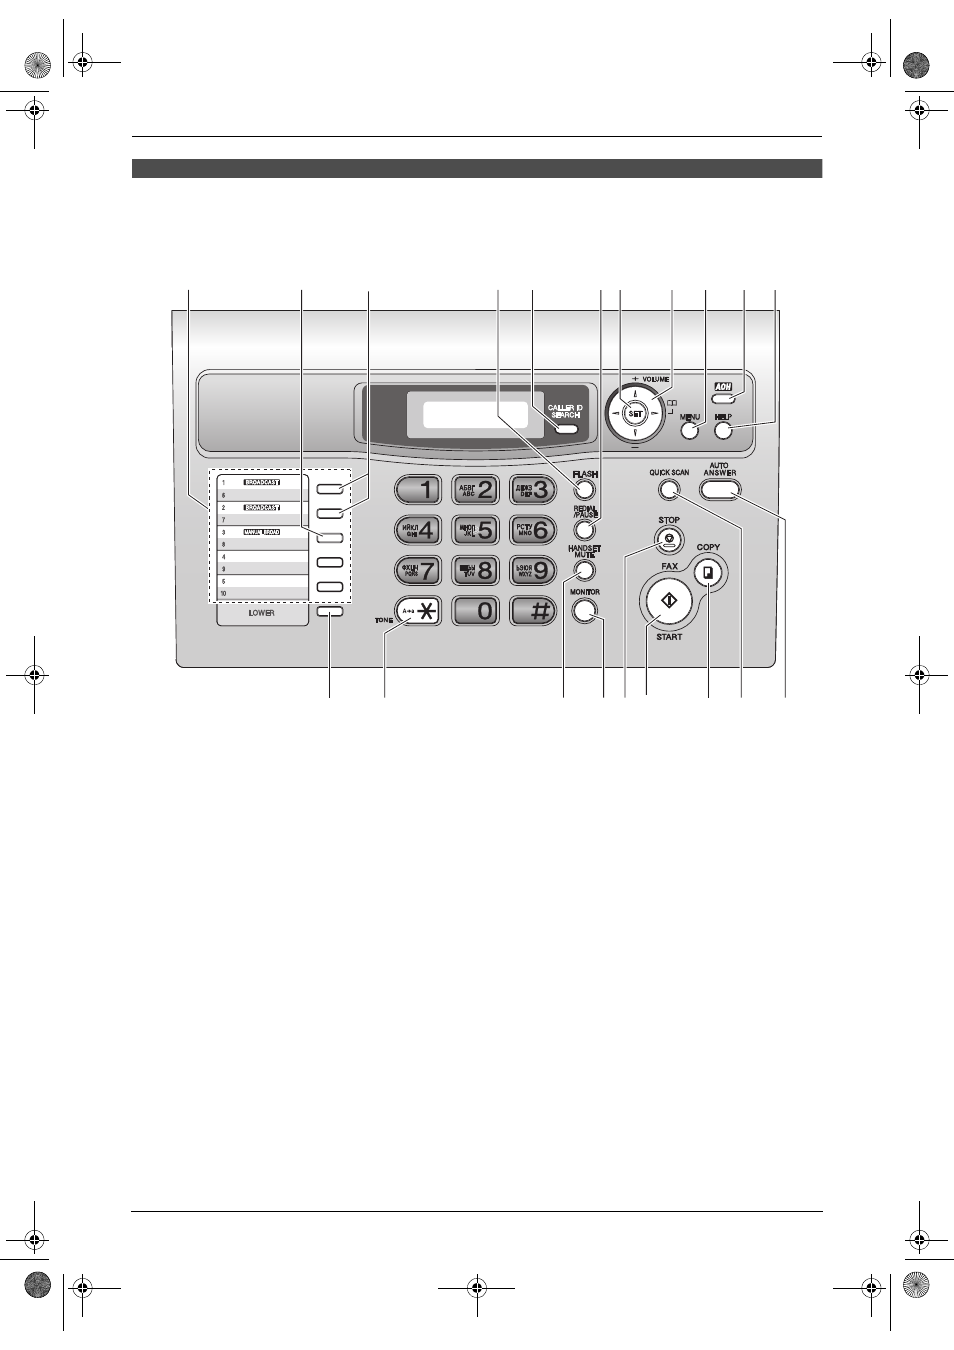 Факс Panasonic Kx-fl403 инструкция